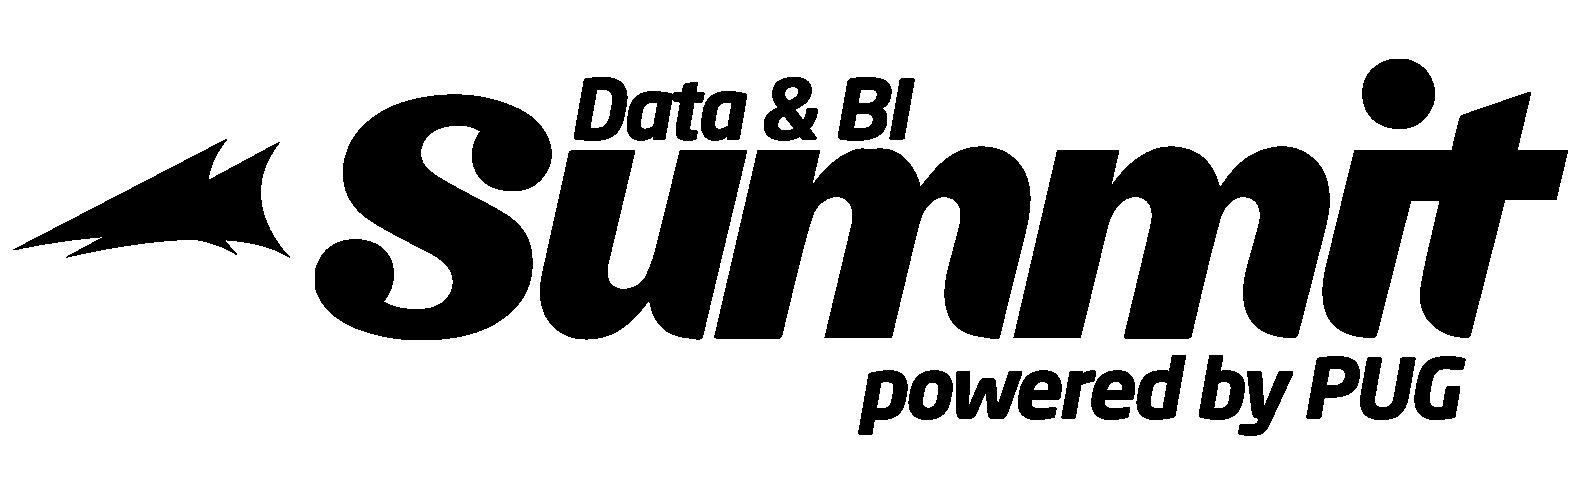 Data-BI-2018-Logo_Powered-Black.png